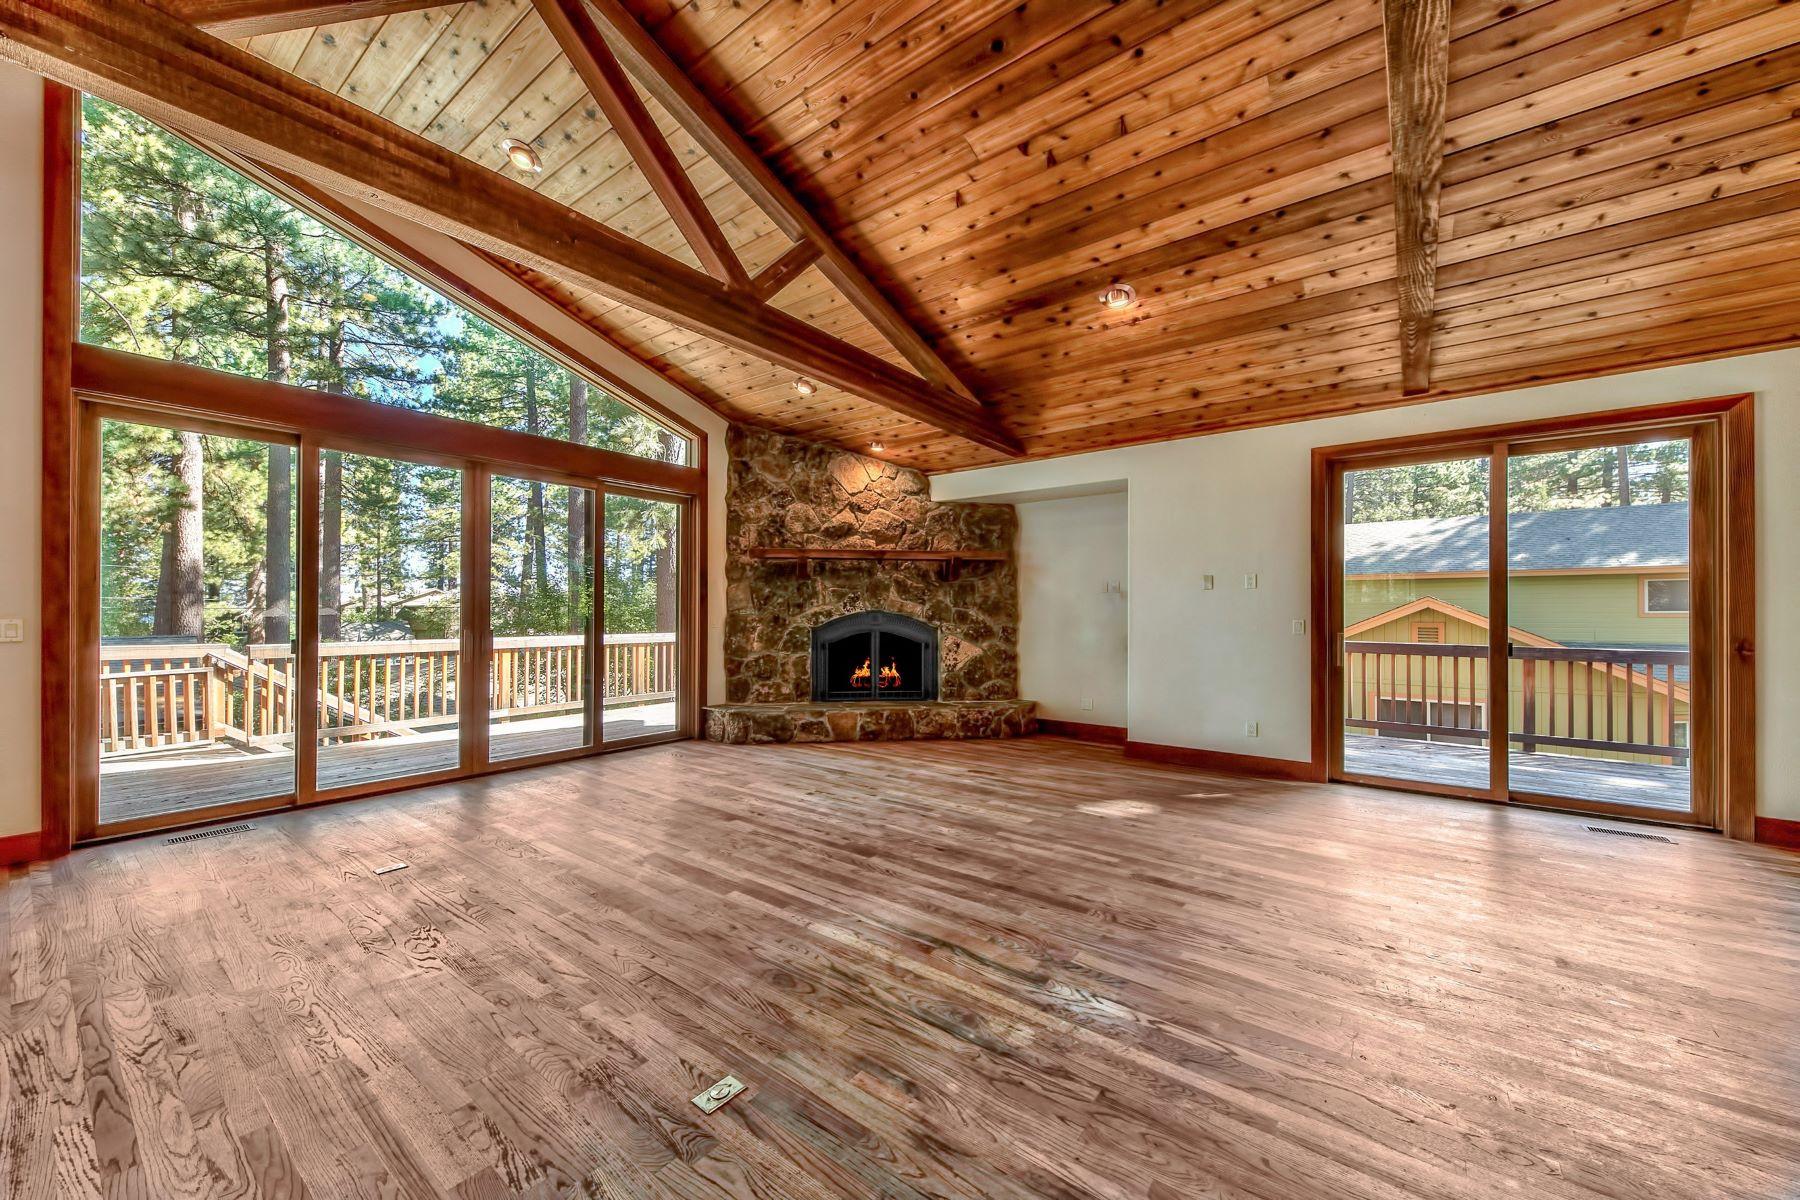 Additional photo for property listing at 945 Merced Ave, South Lake Tahoe, CA 96150 945 Merced Ave 南太浩湖, 加利福尼亚州 96150 美国